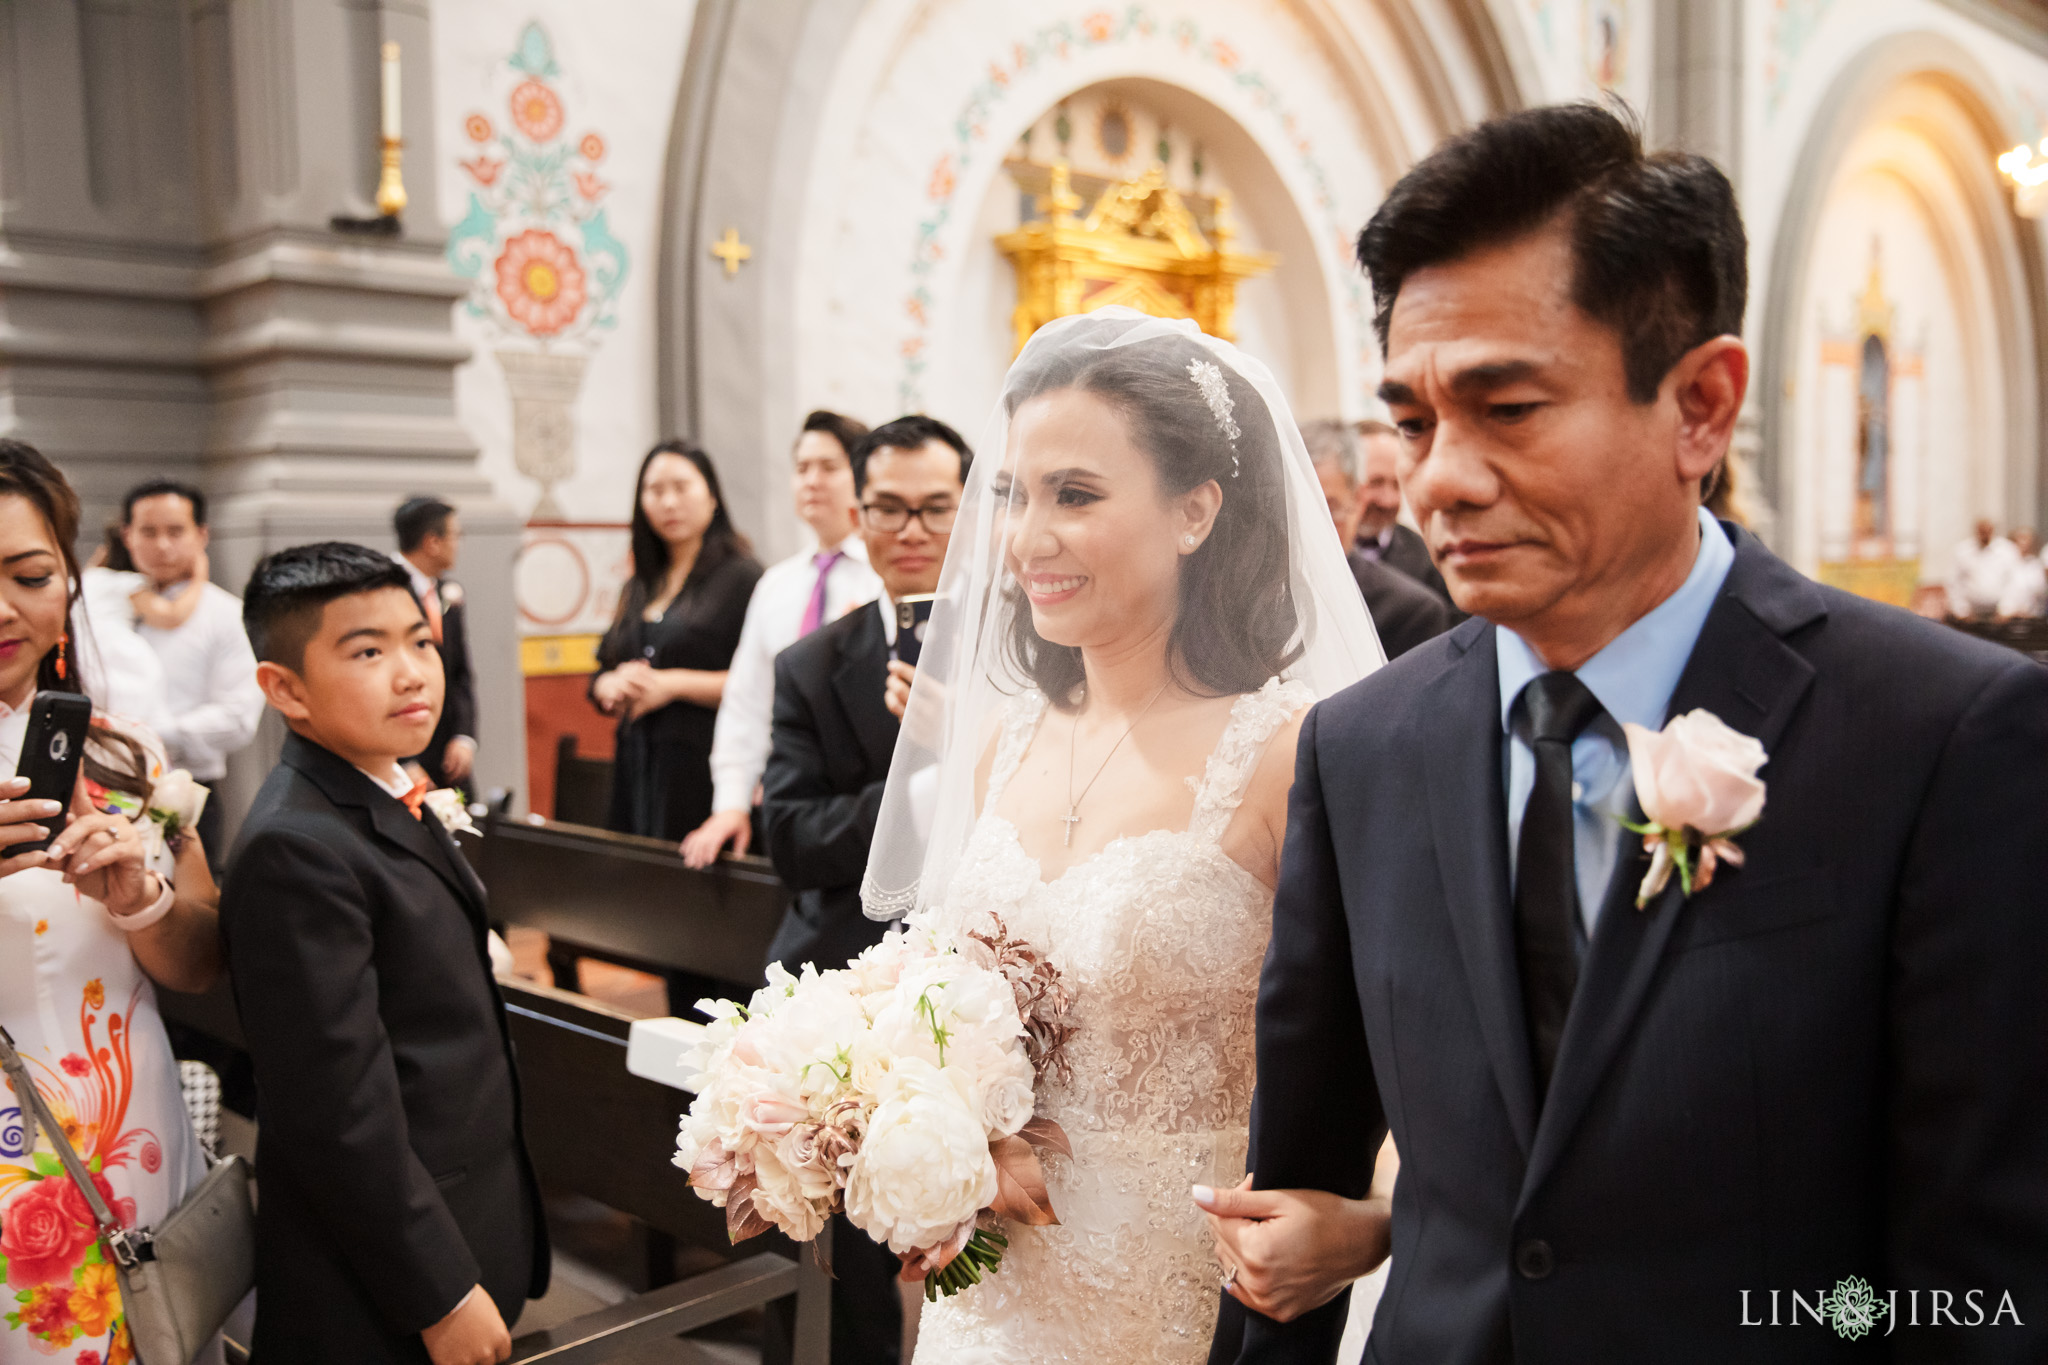 15 Mission Basilica San Juan Capistrano Wedding Photography